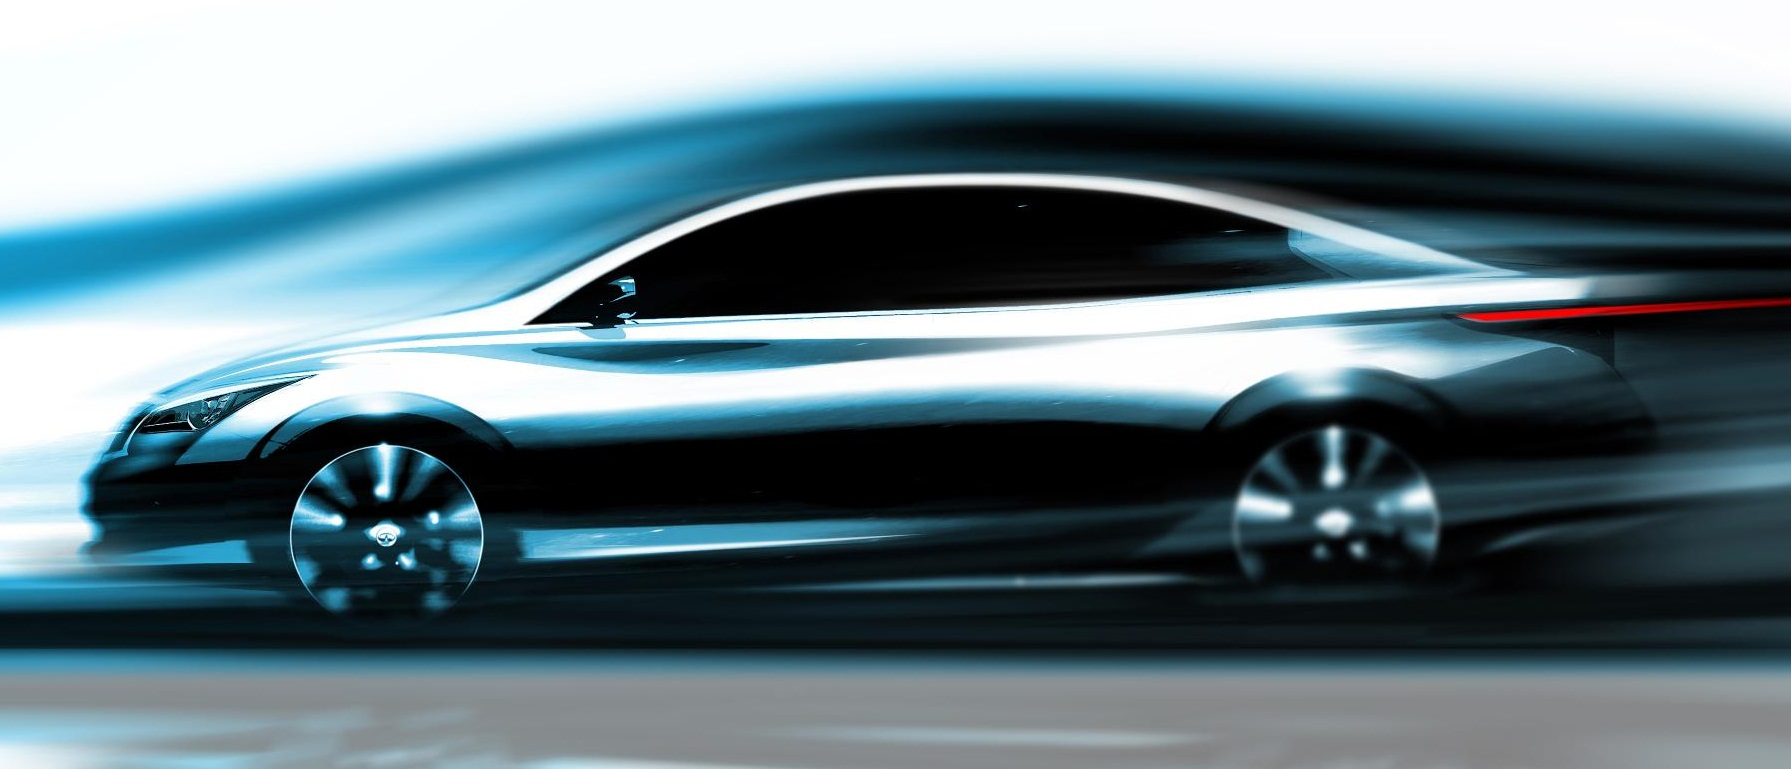 New Acura NSX, 2012 Mazda CX-5, Electric Infiniti Sedan: Car News Headlines